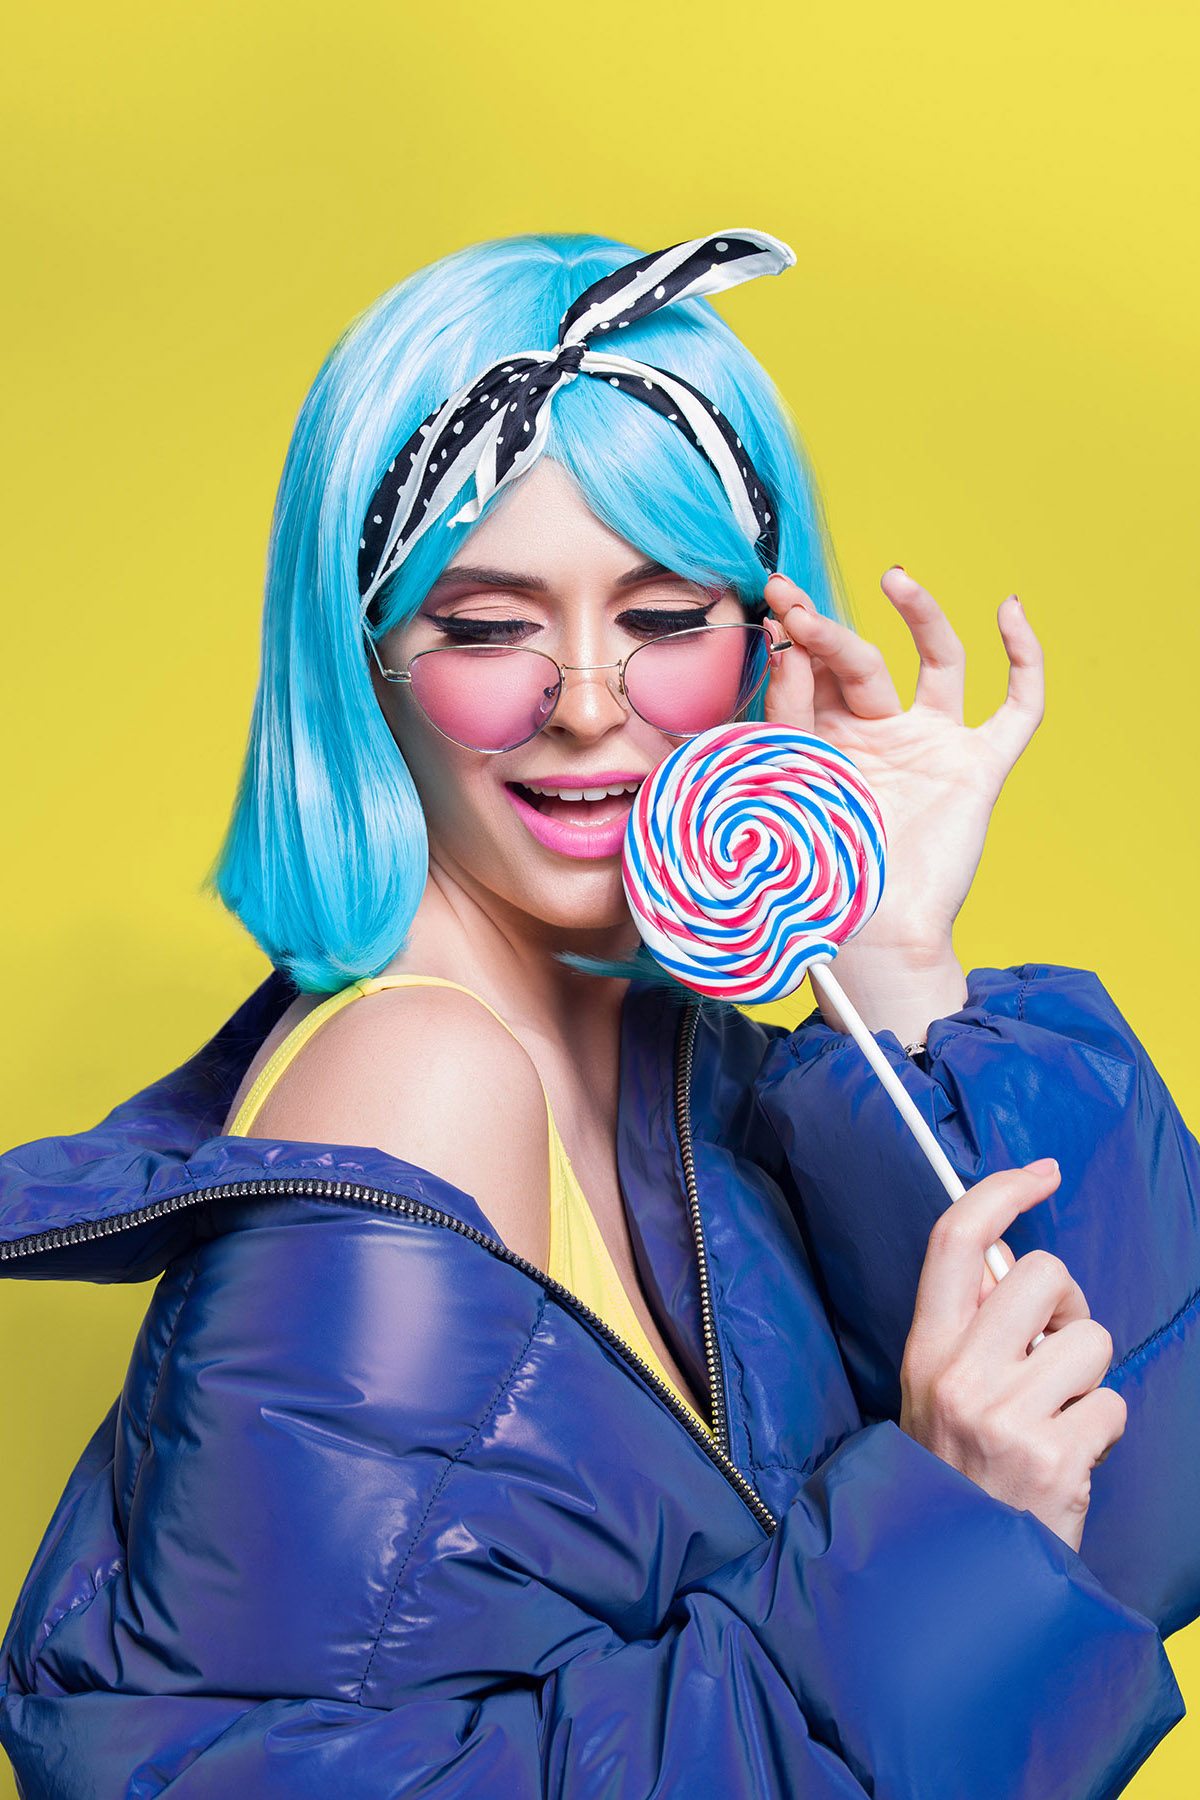 Fashion lookbook photoshoot at Dubai Fashion Institute FAD by Loesje Kessels